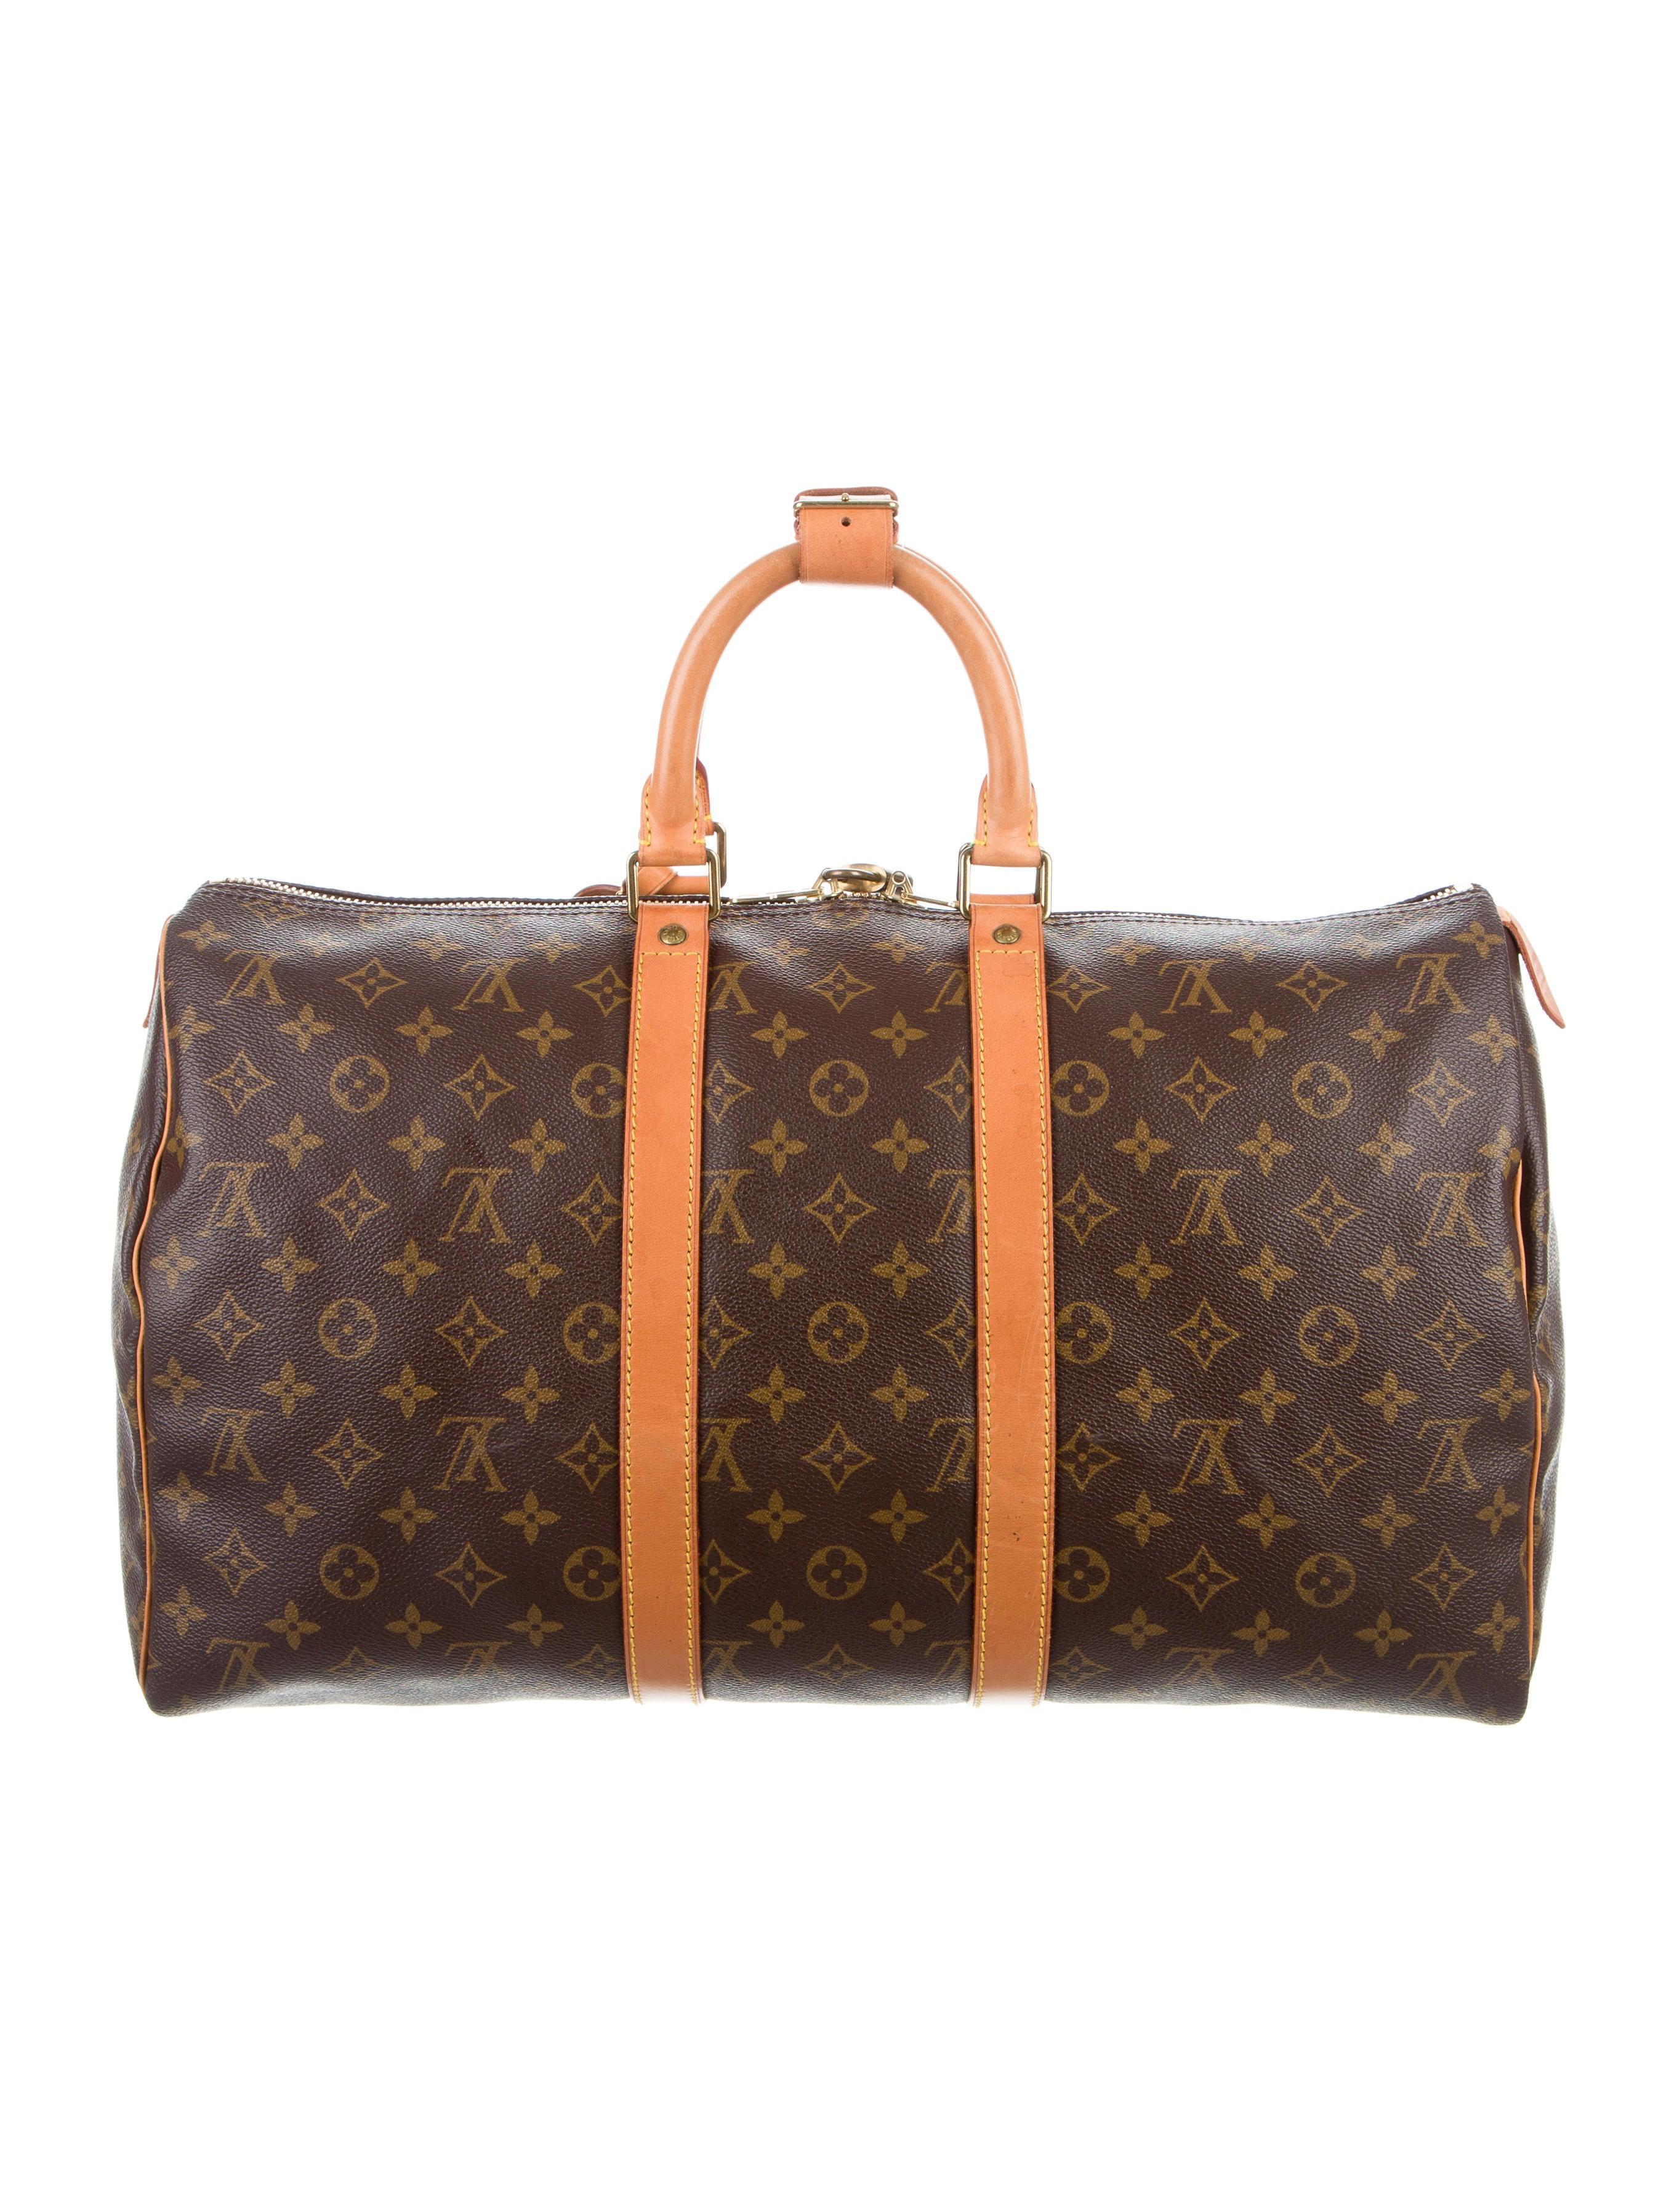 louis vuitton monogram keepall 45 handbags lou119930 the realreal. Black Bedroom Furniture Sets. Home Design Ideas